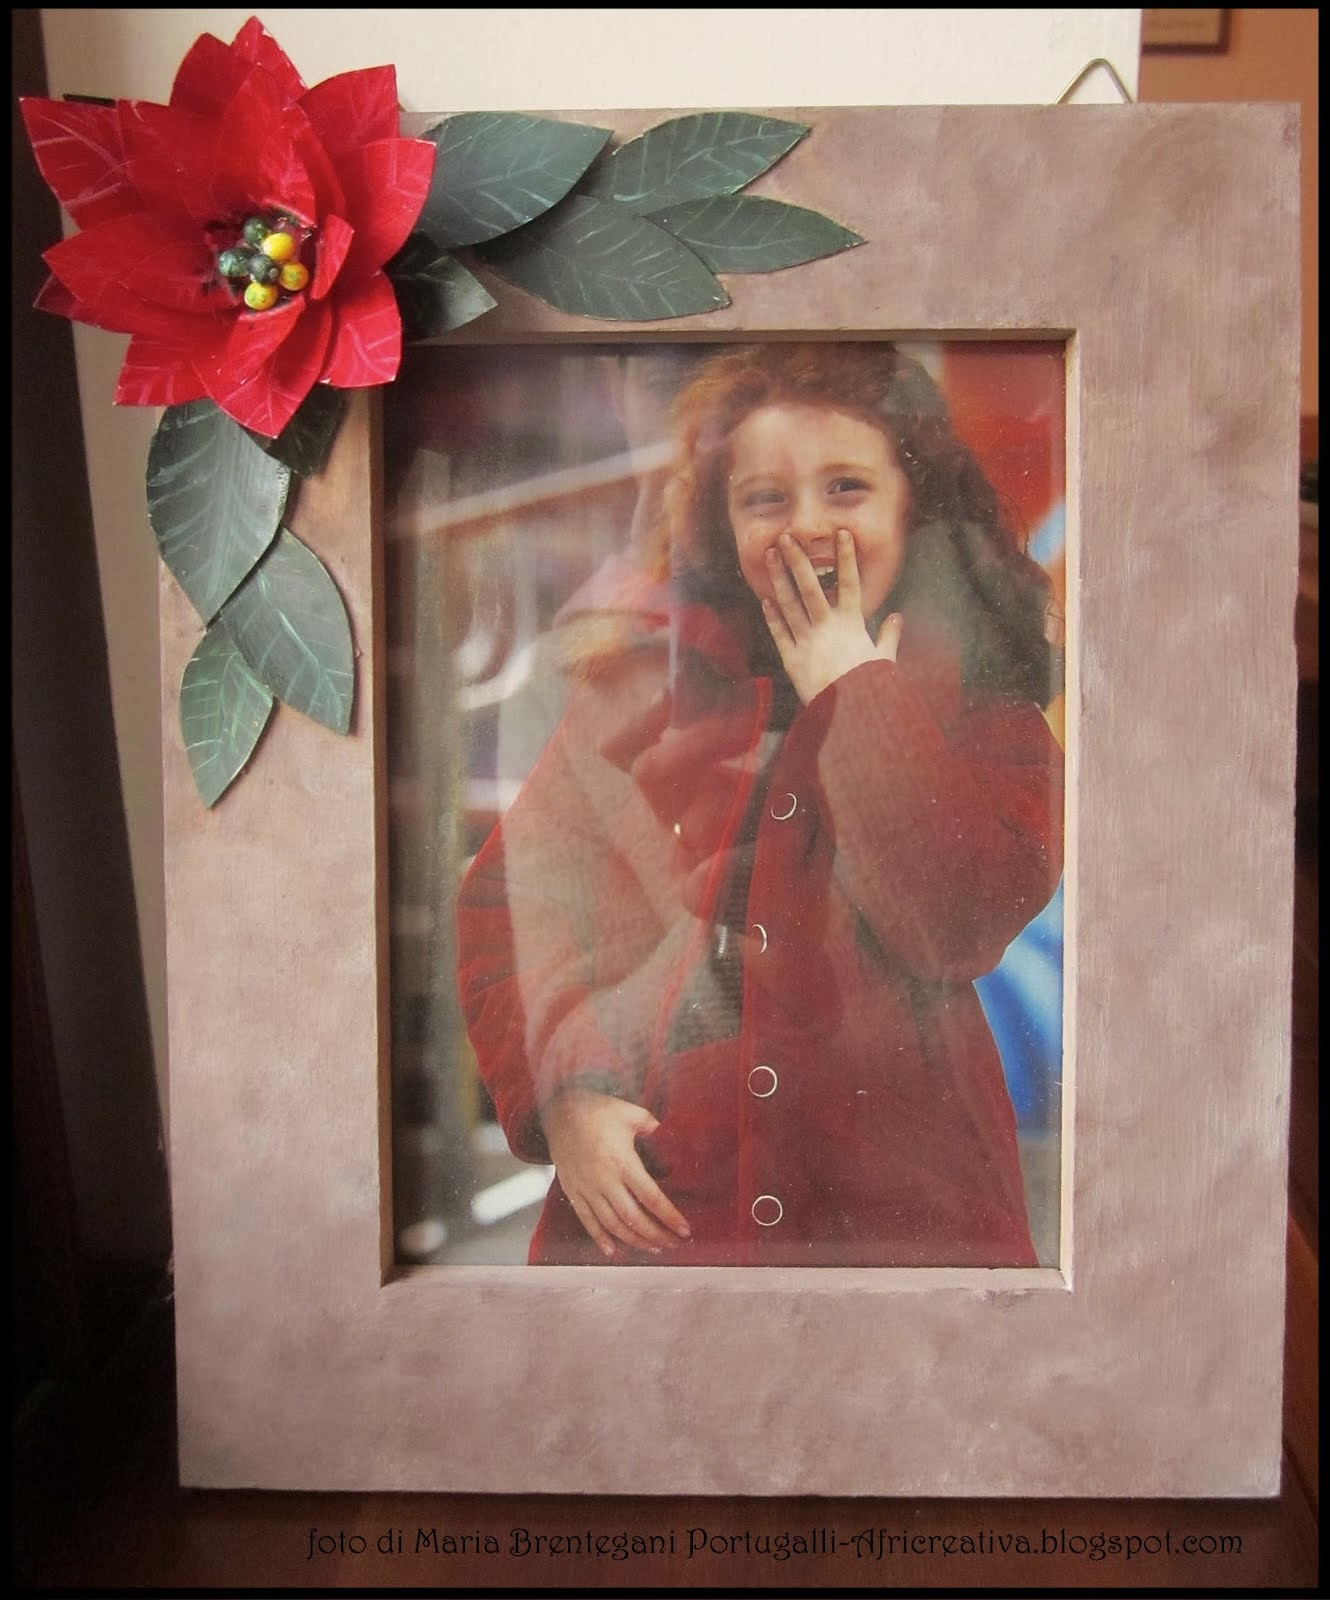 Portafoto da parete